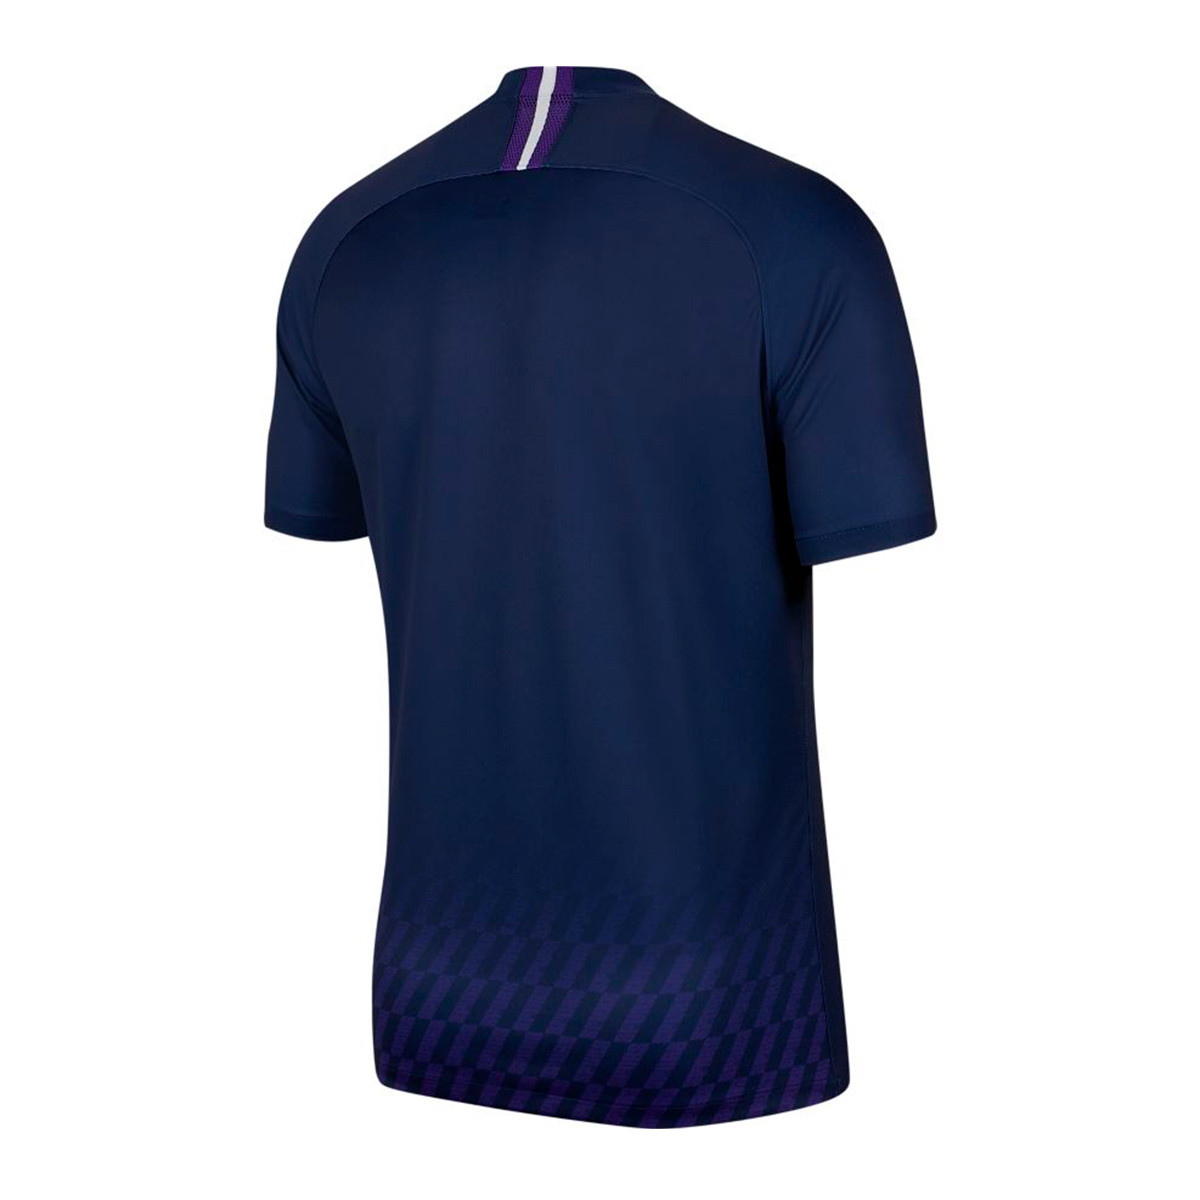 Jersey Nike Tottenham Hotspur Breathe Stadium Segunda Equipacion 2019 2020 Binary Blue White Football Store Futbol Emotion